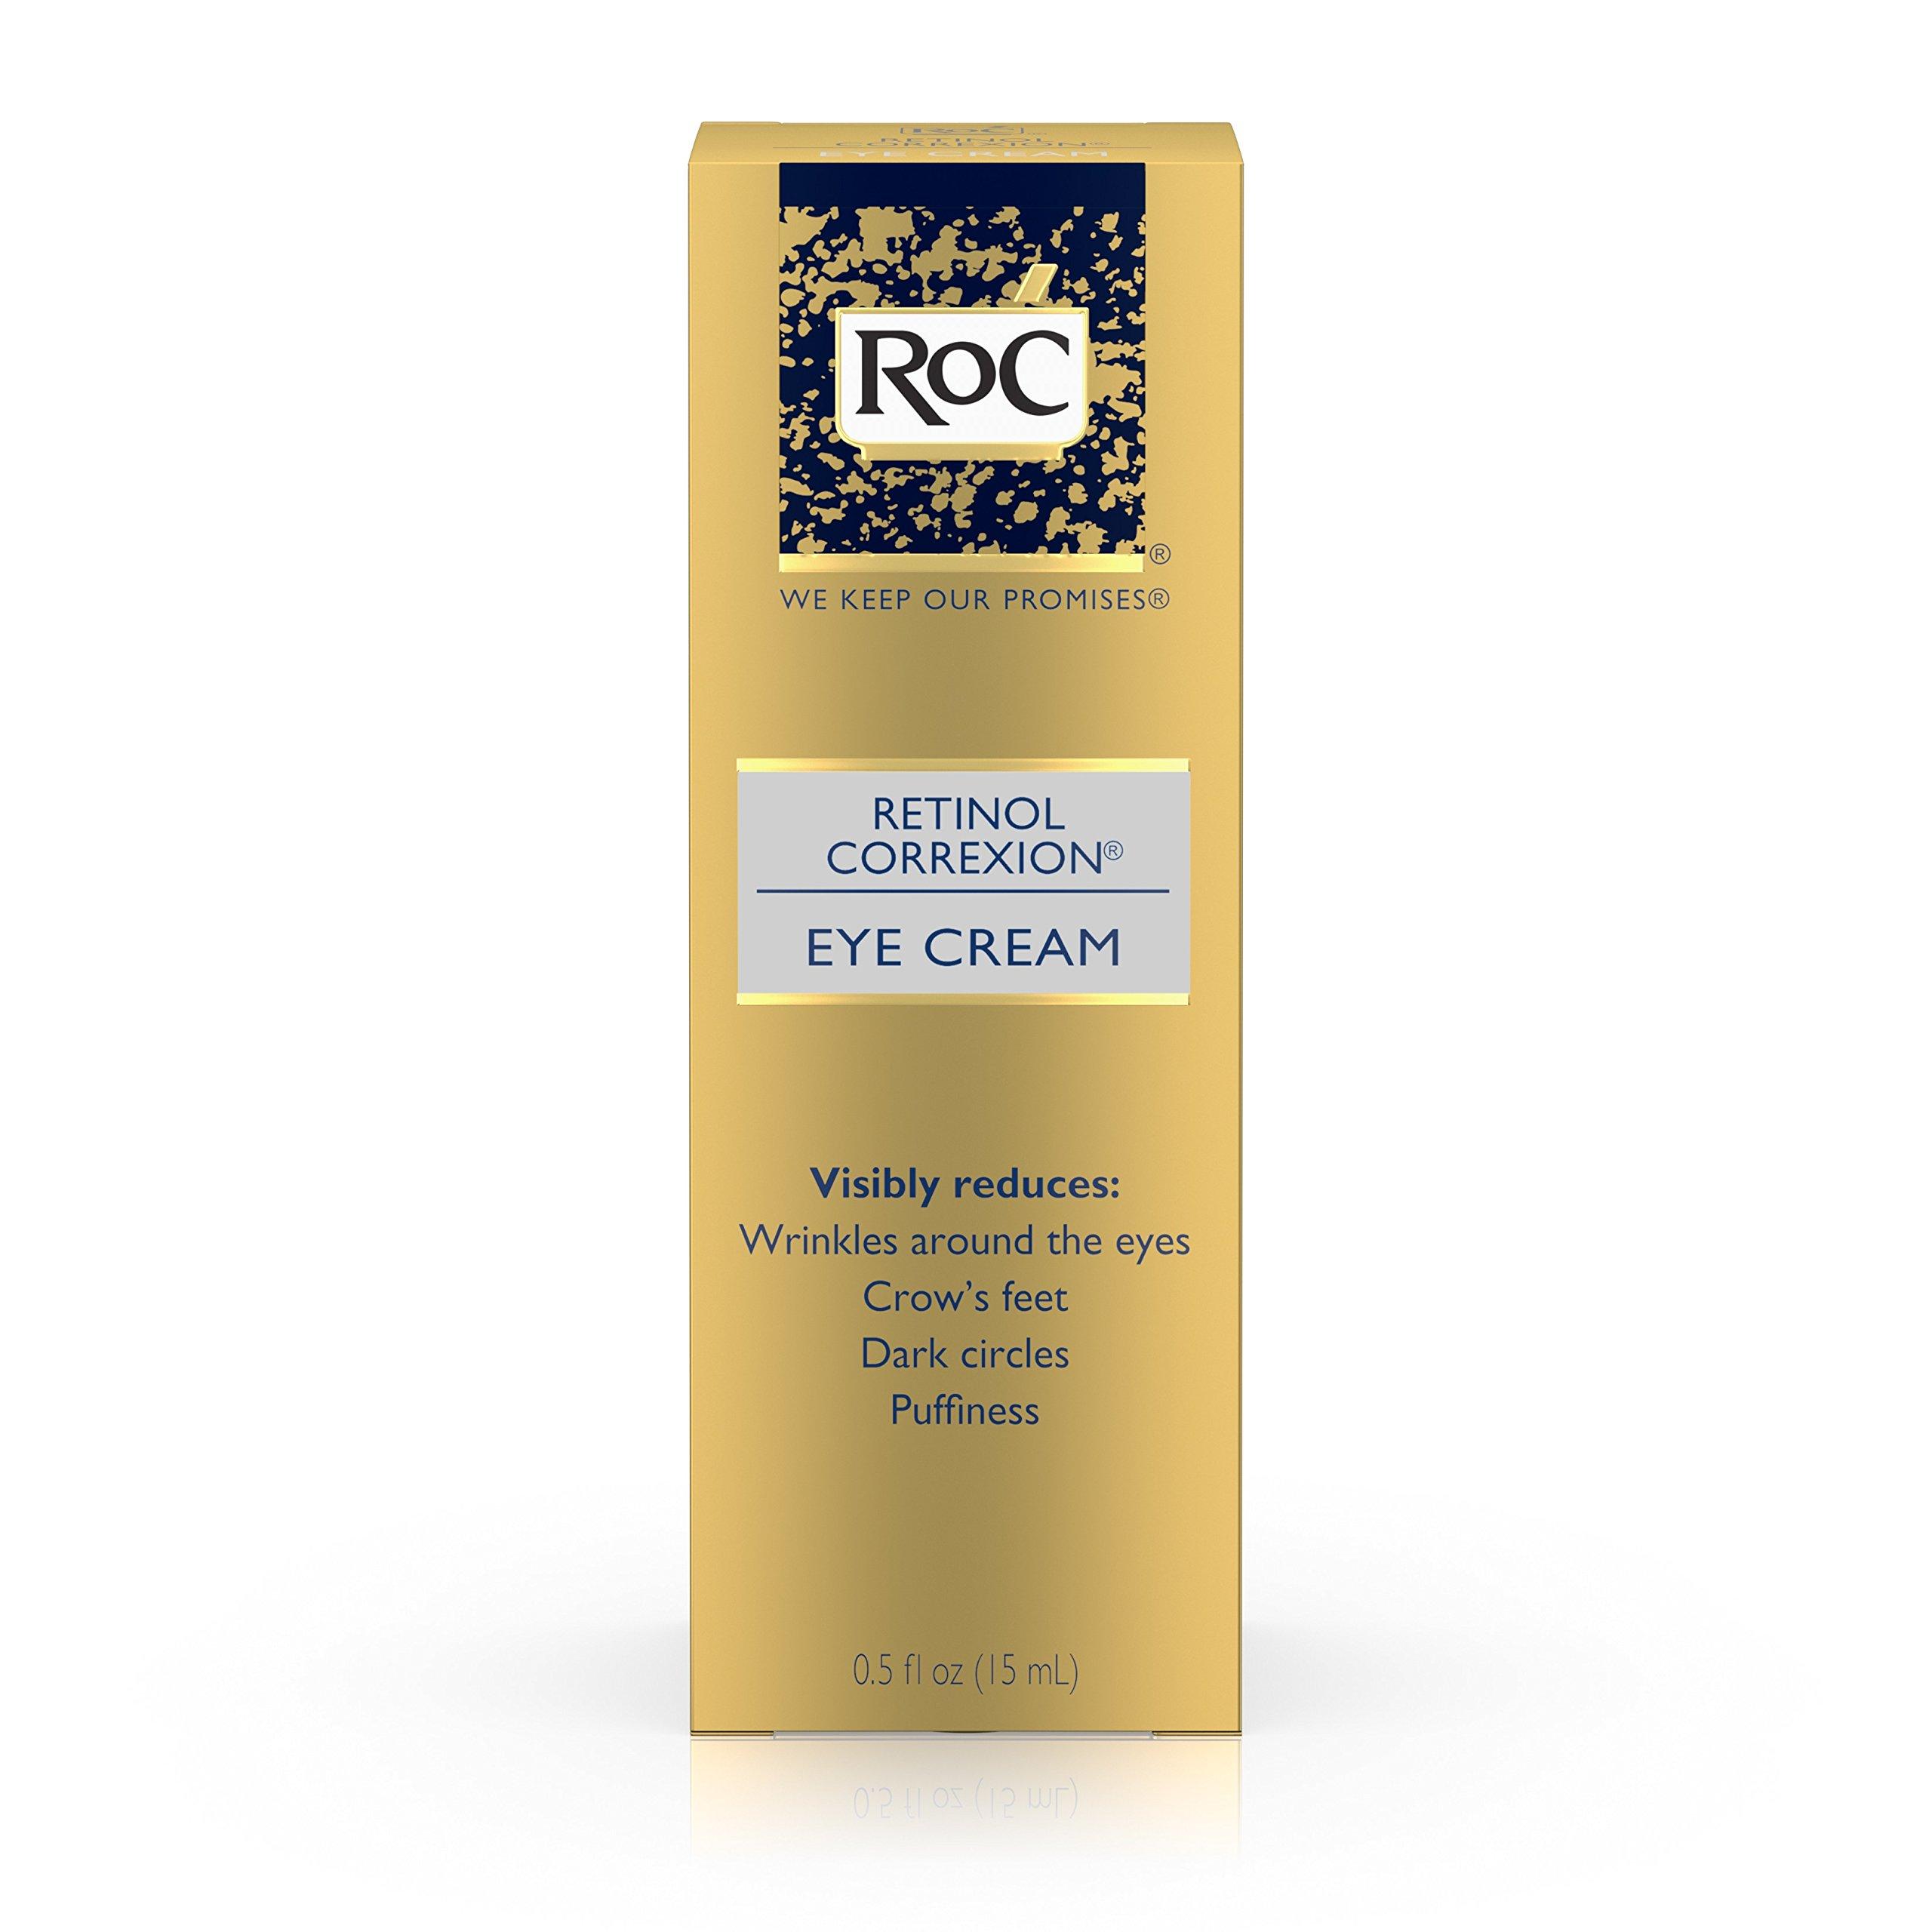 Roc Retinol Correxion Anti-Aging Eye Cream Treatment for Eye Wrinkles, Crows Feet, Dark Circles, and Puffiness .5 fl. oz